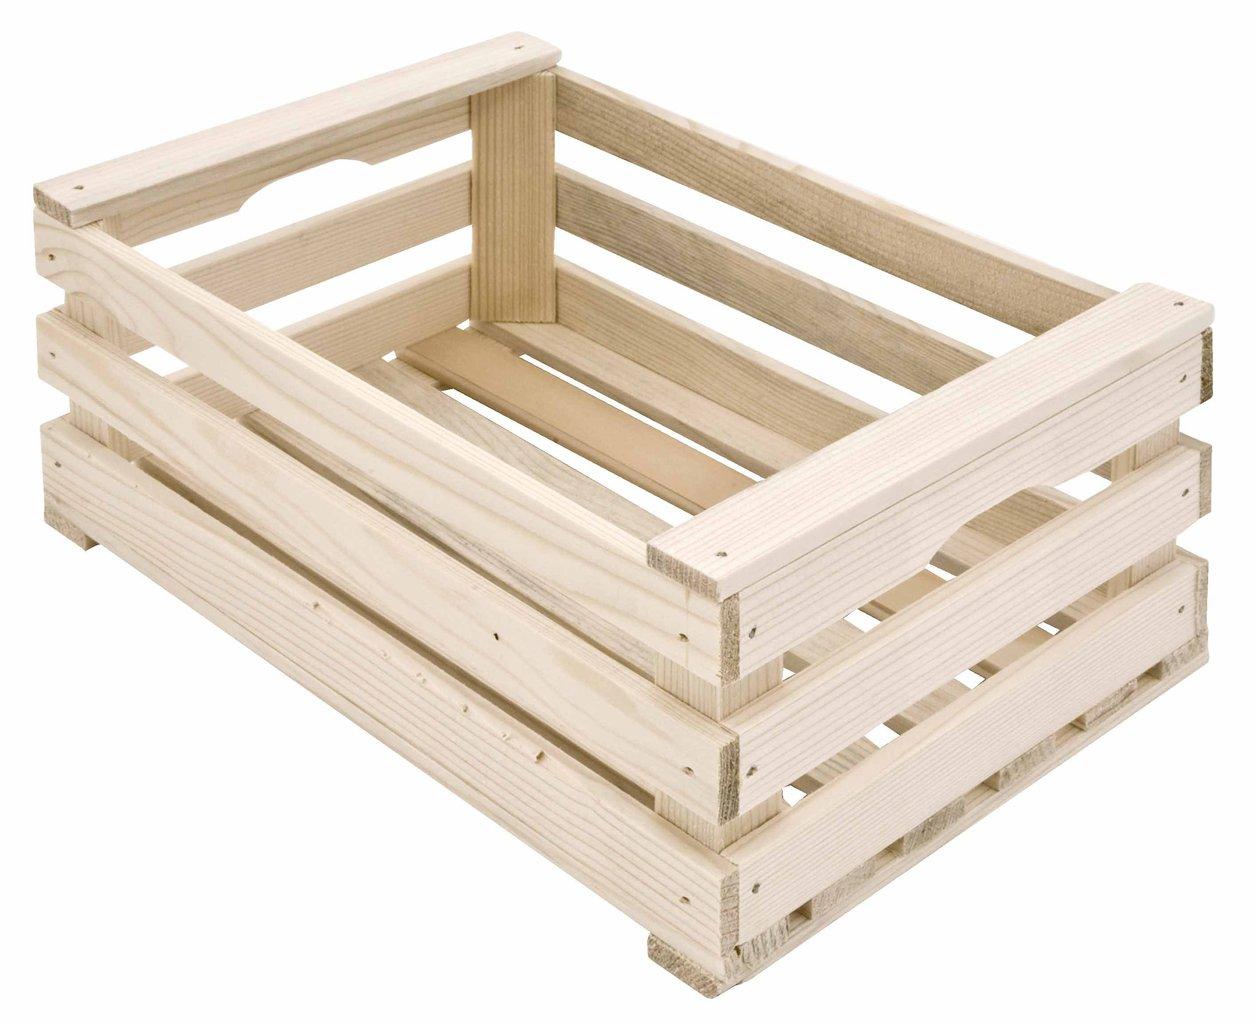 Cassetta in legno 25x17x11 h compra online rosi store for Ikea cassette legno